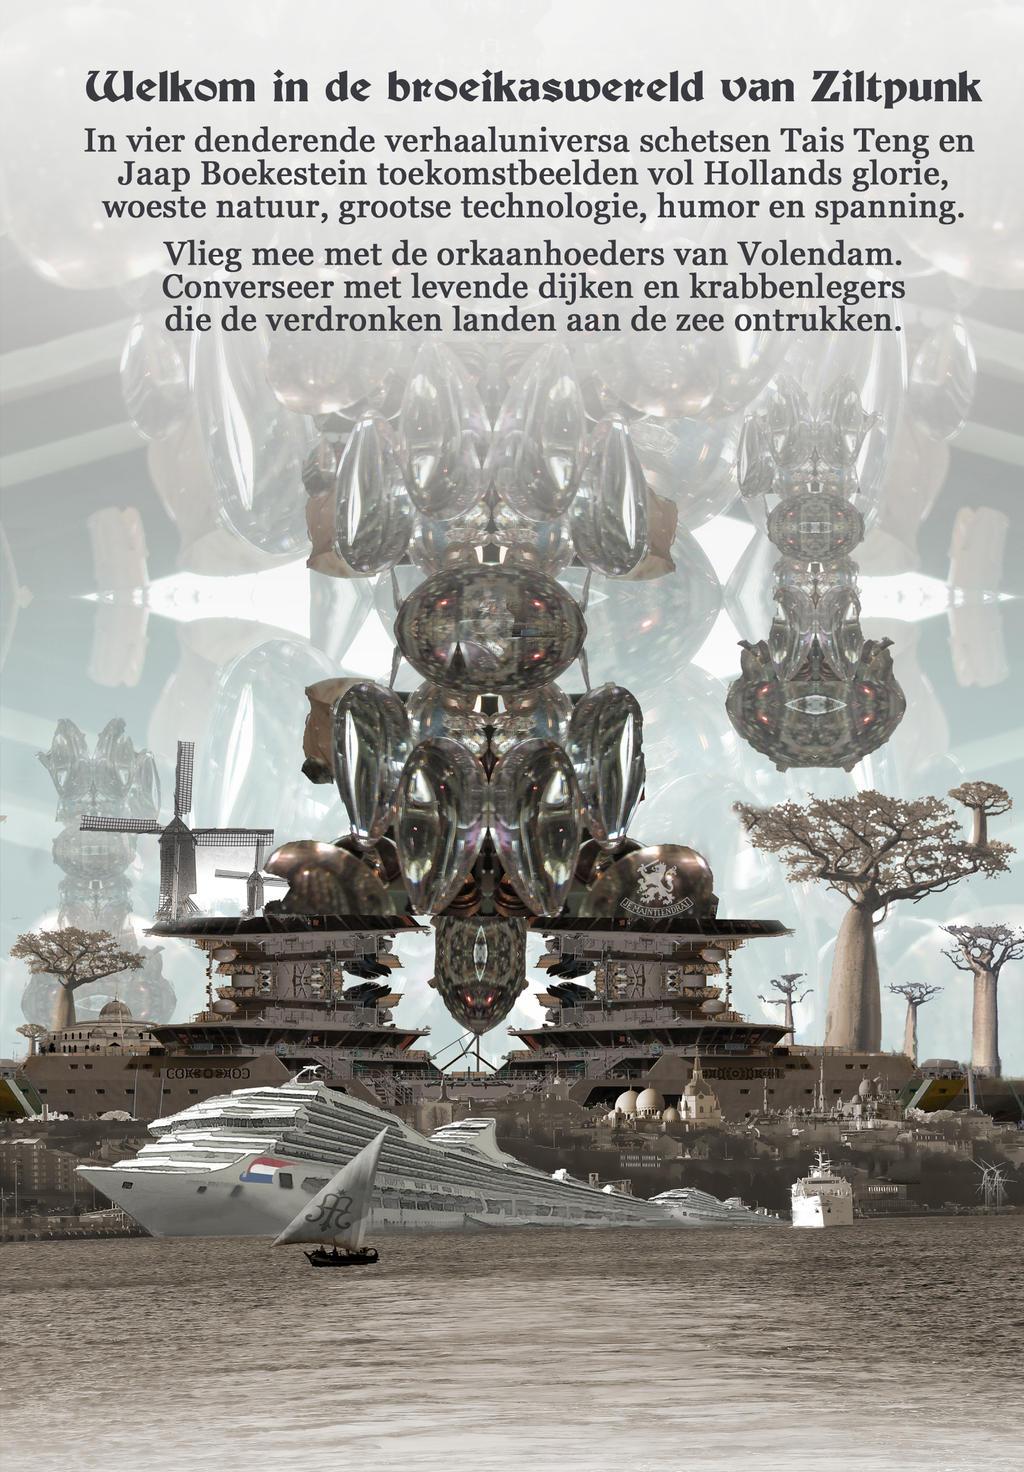 back cover ORKAANHOEDERS EN DIJKENFLUISTERAARS by taisteng